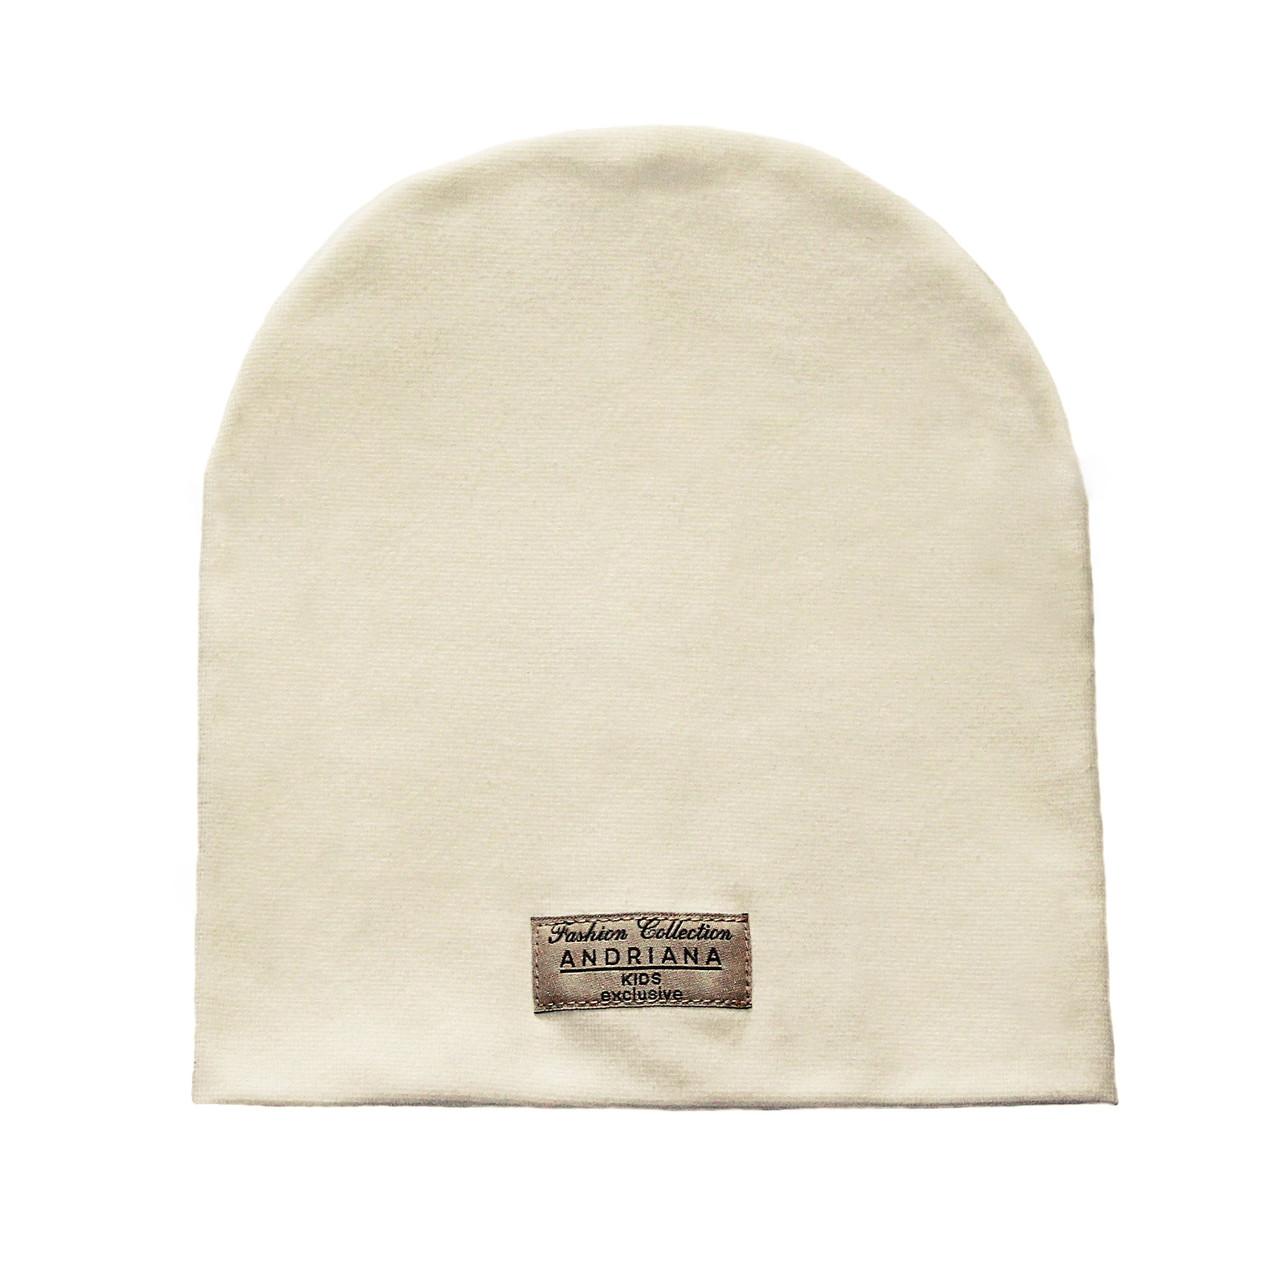 Двойная шапочка 44-46,48-50,52-54 см. Andriana Kids молочная